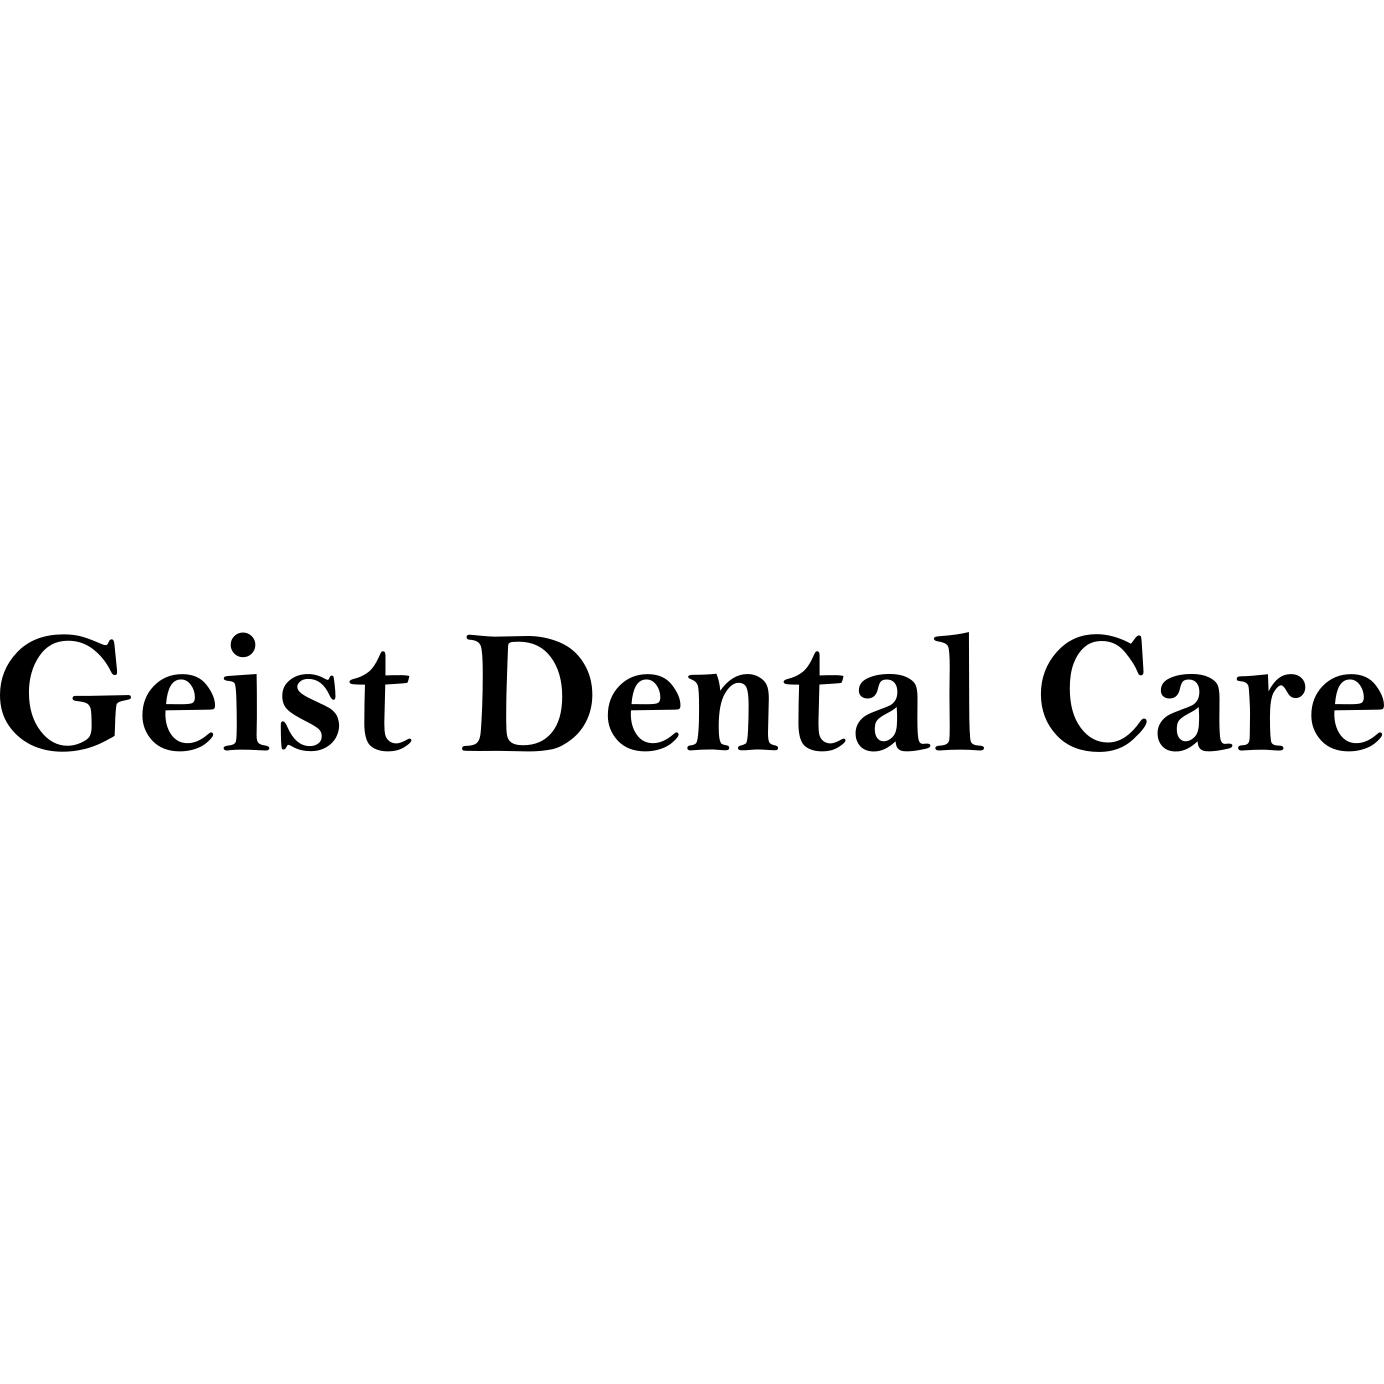 Geist Dental Care